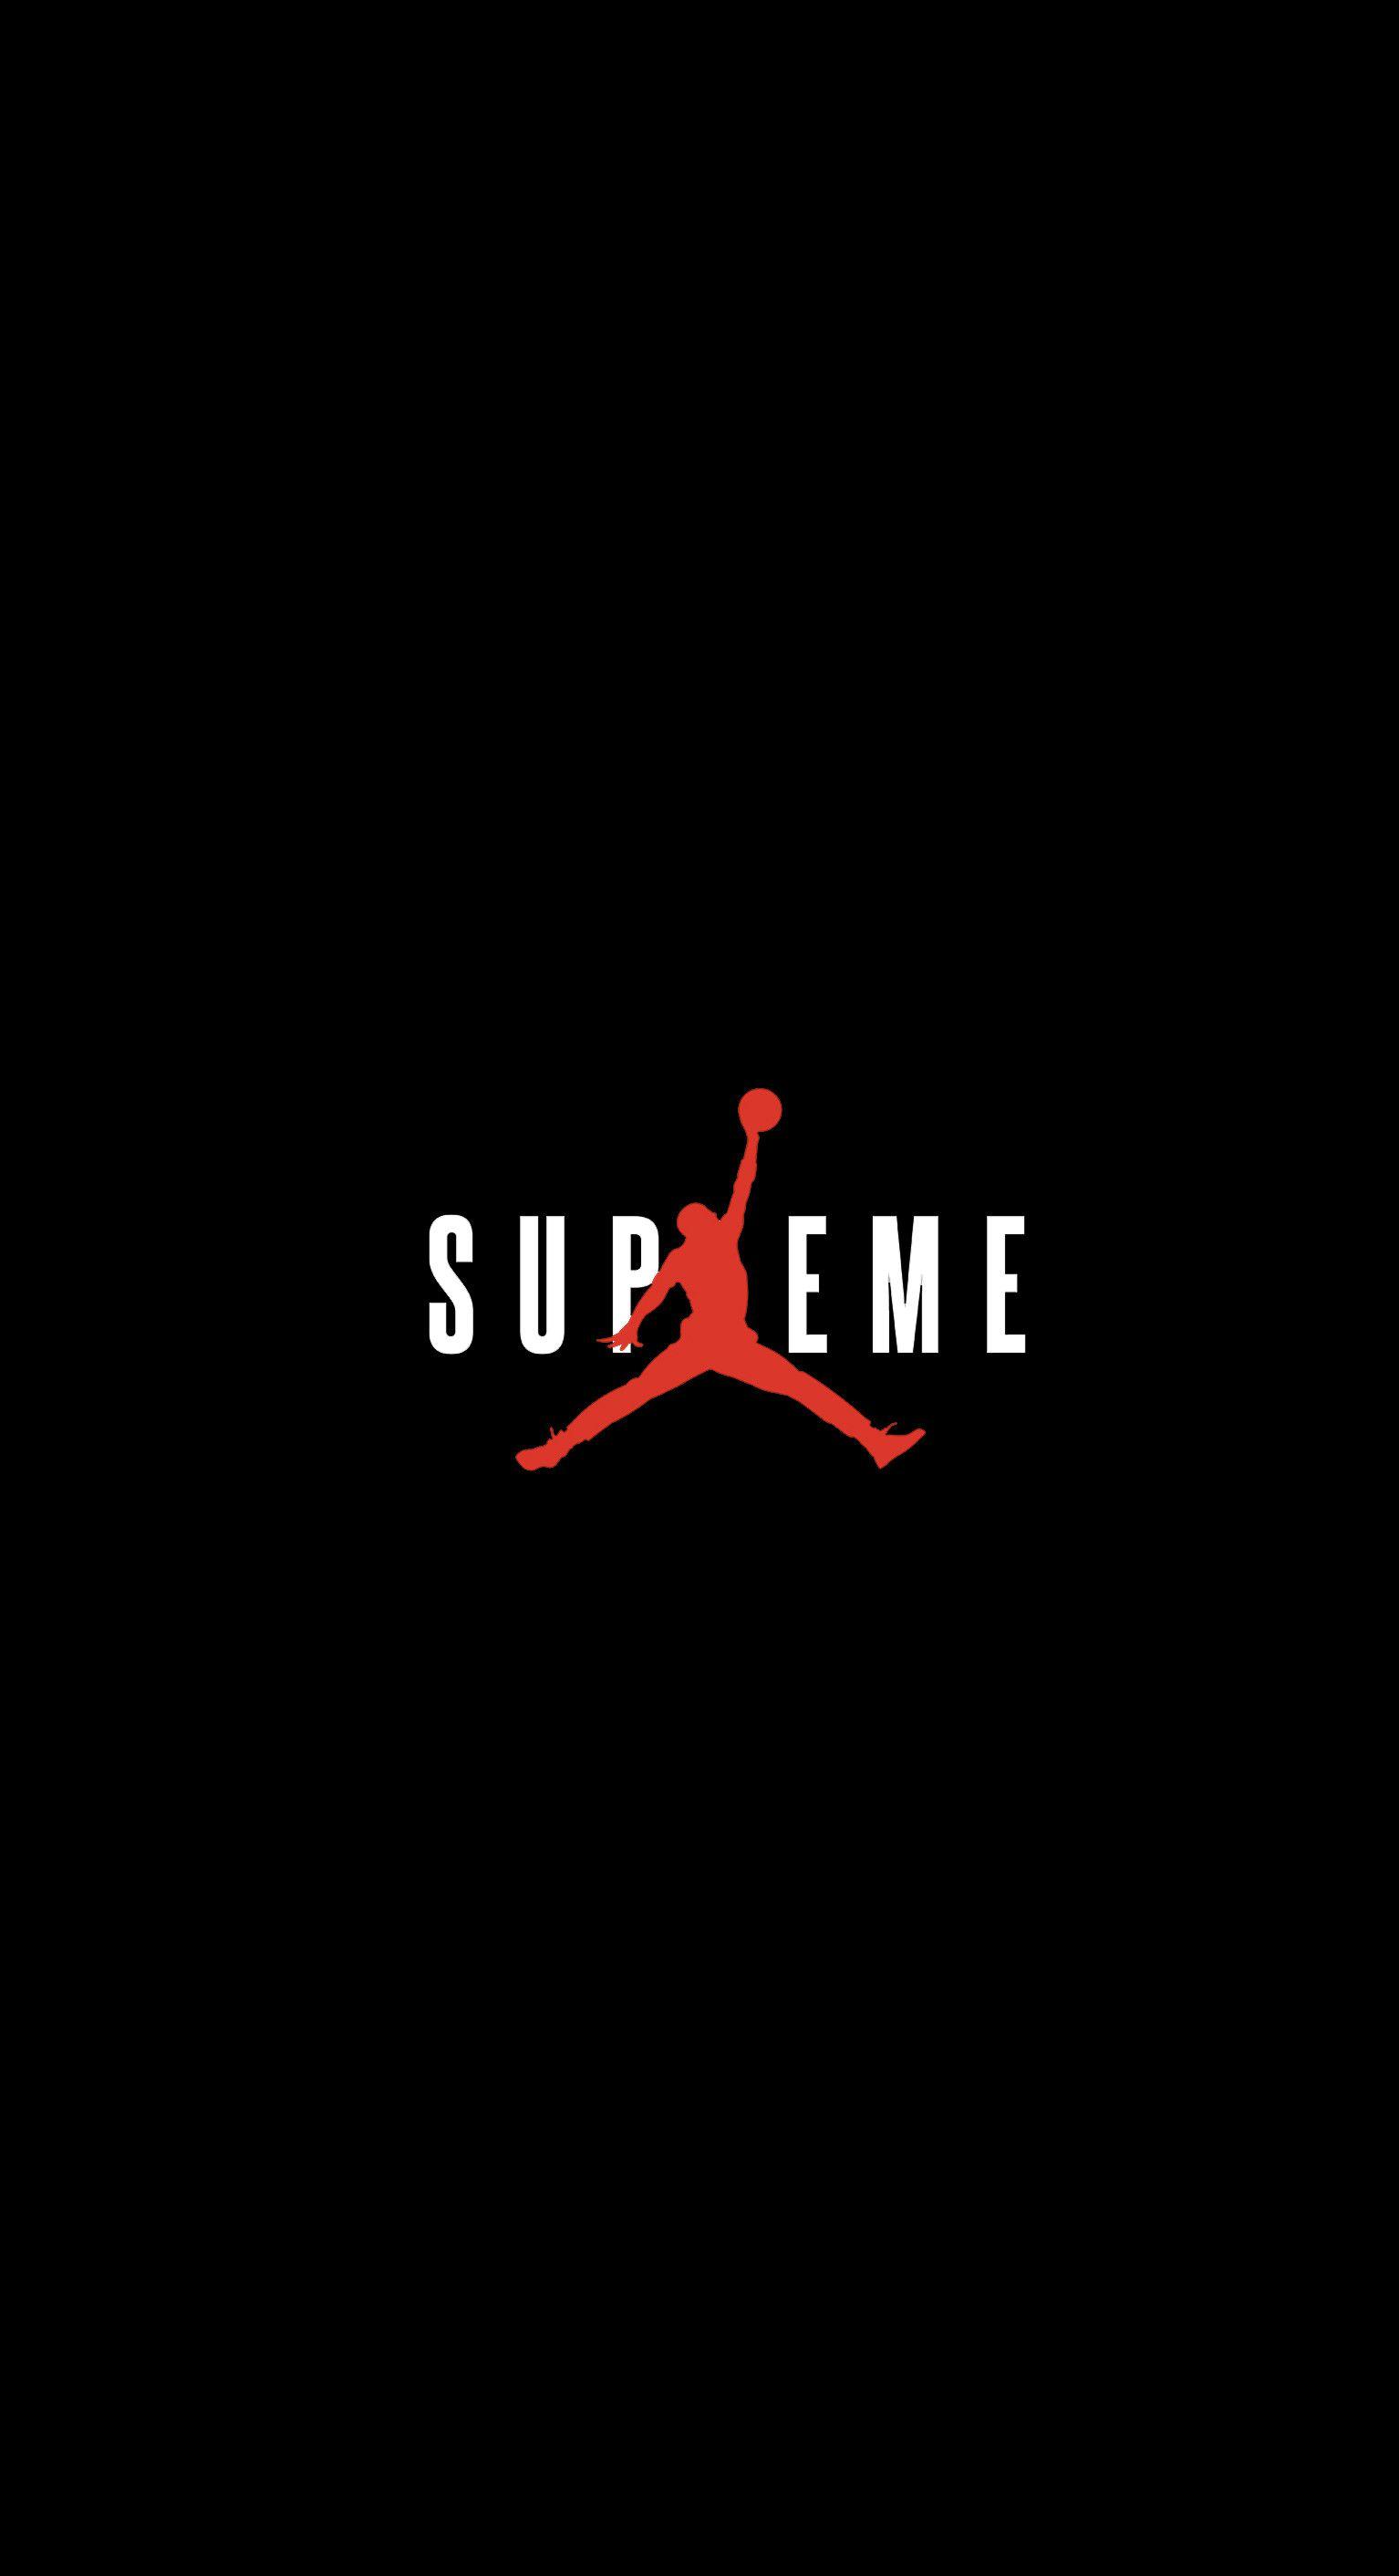 Supreme Brand Wallpapers   Top Supreme Brand Backgrounds 1534x2824